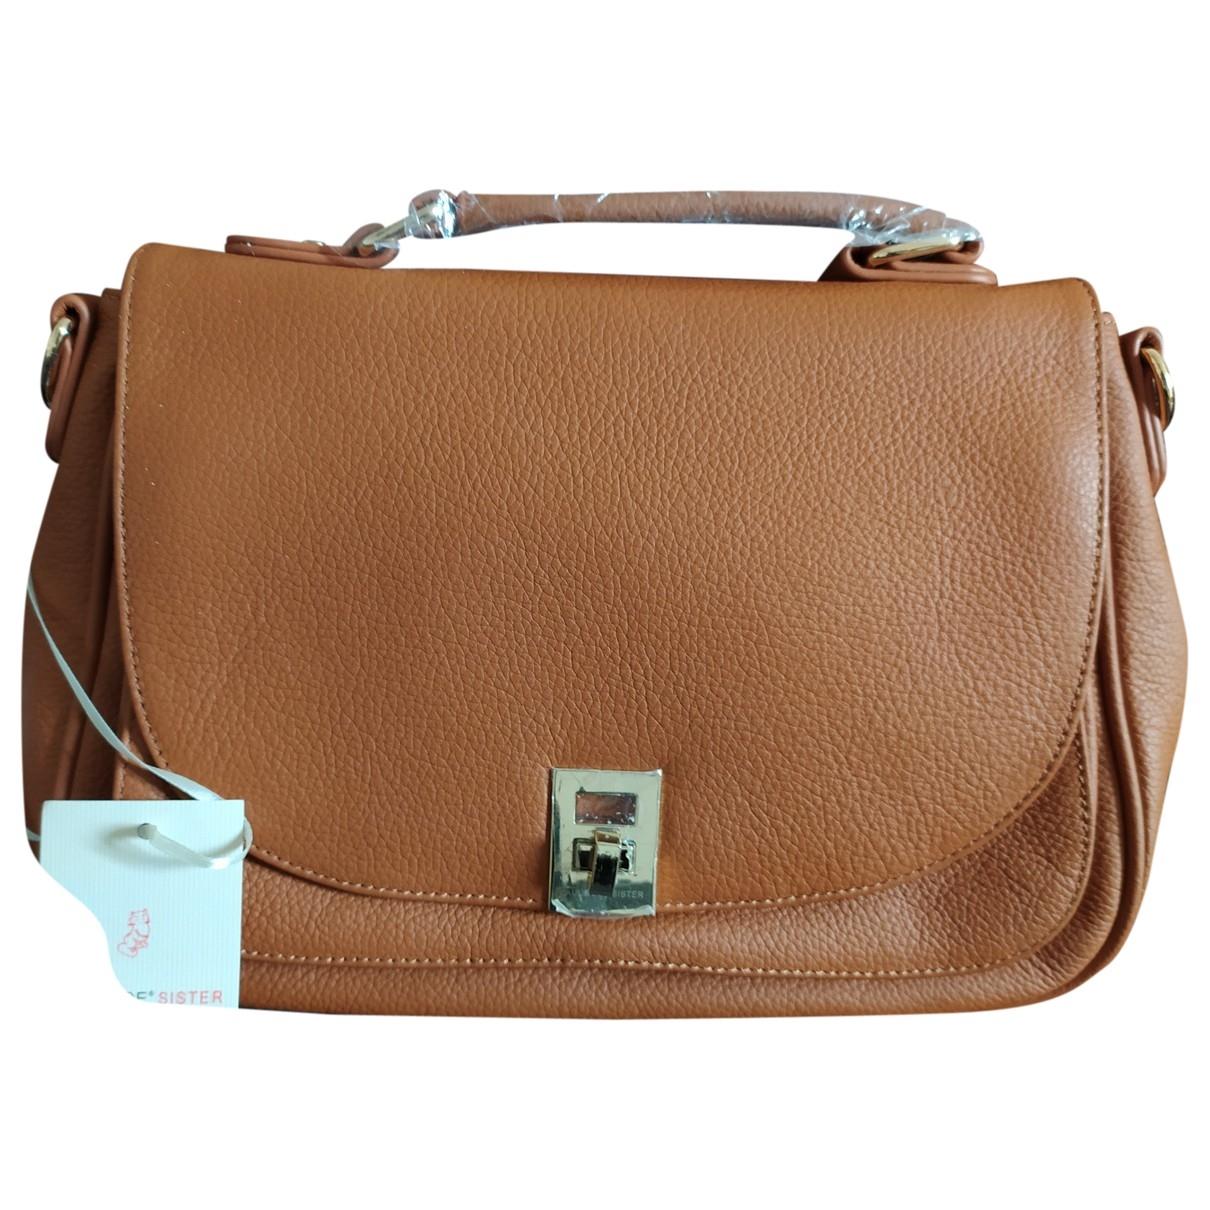 Paul & Joe \N Camel Leather handbag for Women \N